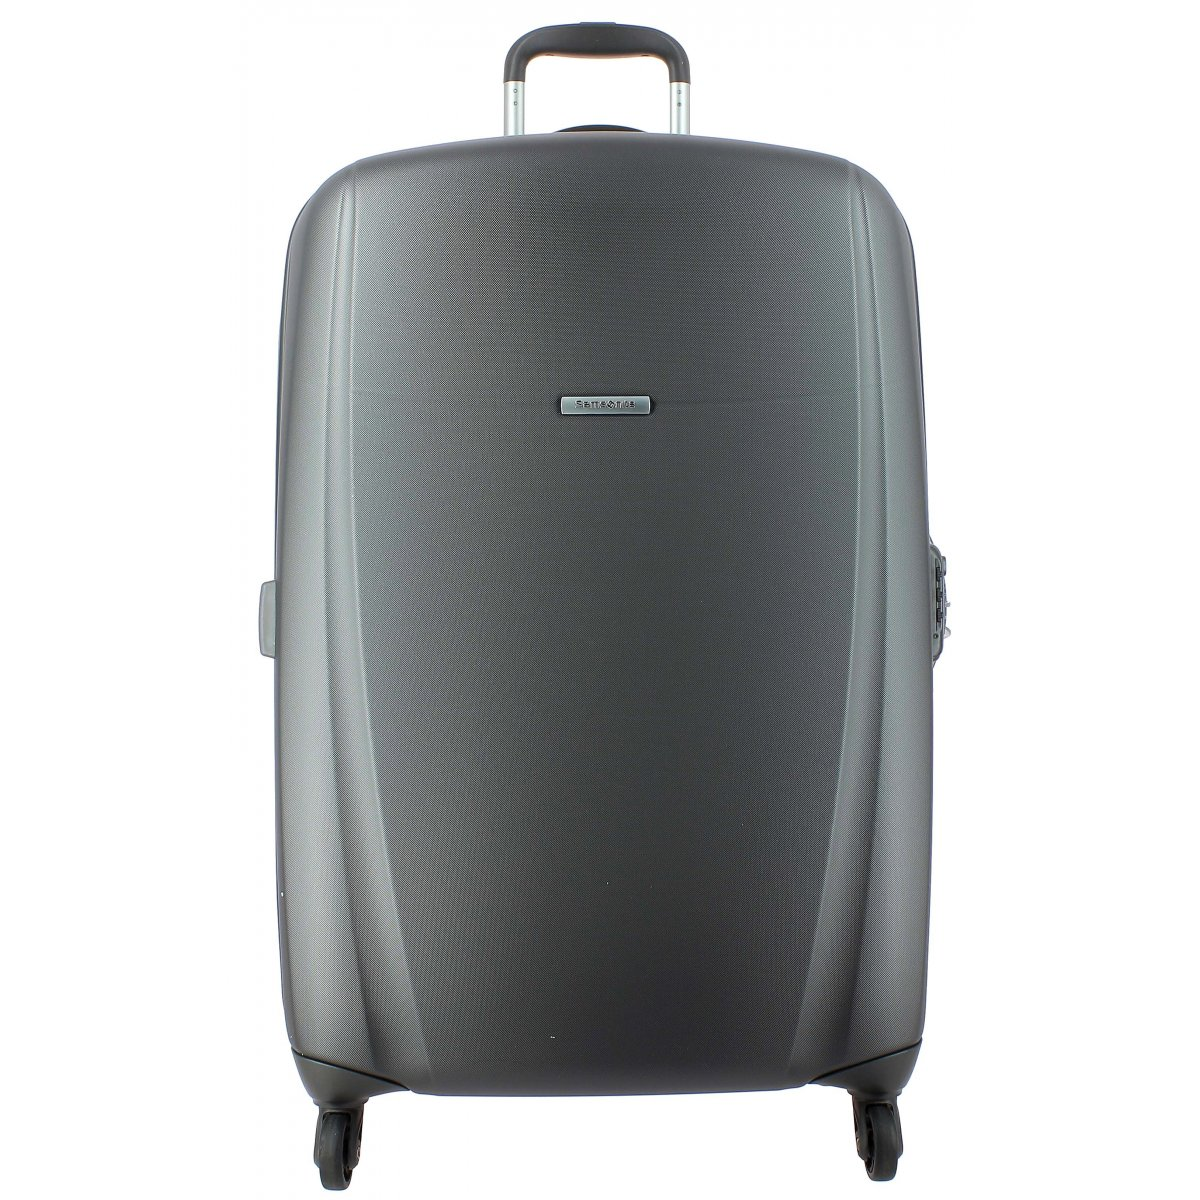 valise samsonite bright lite 2 0 spinner 74 cm brightlite90 couleur principale graphite. Black Bedroom Furniture Sets. Home Design Ideas